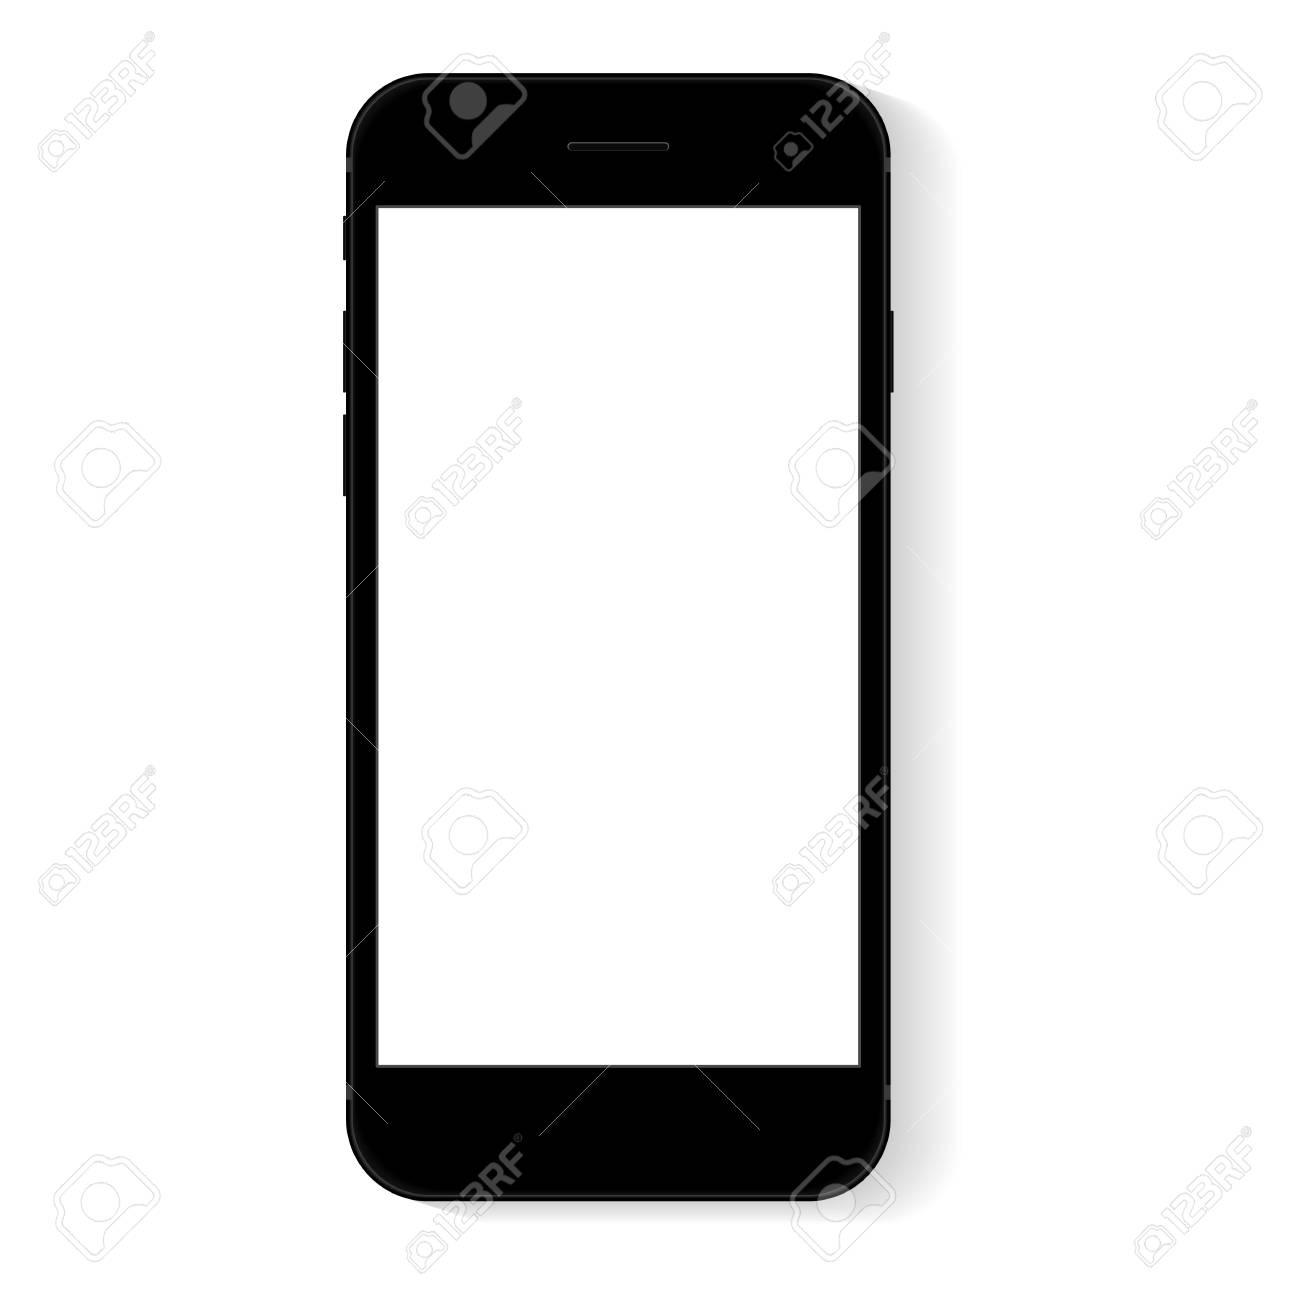 flat phone white screen, vector drawing modern smart phone design - 82077036